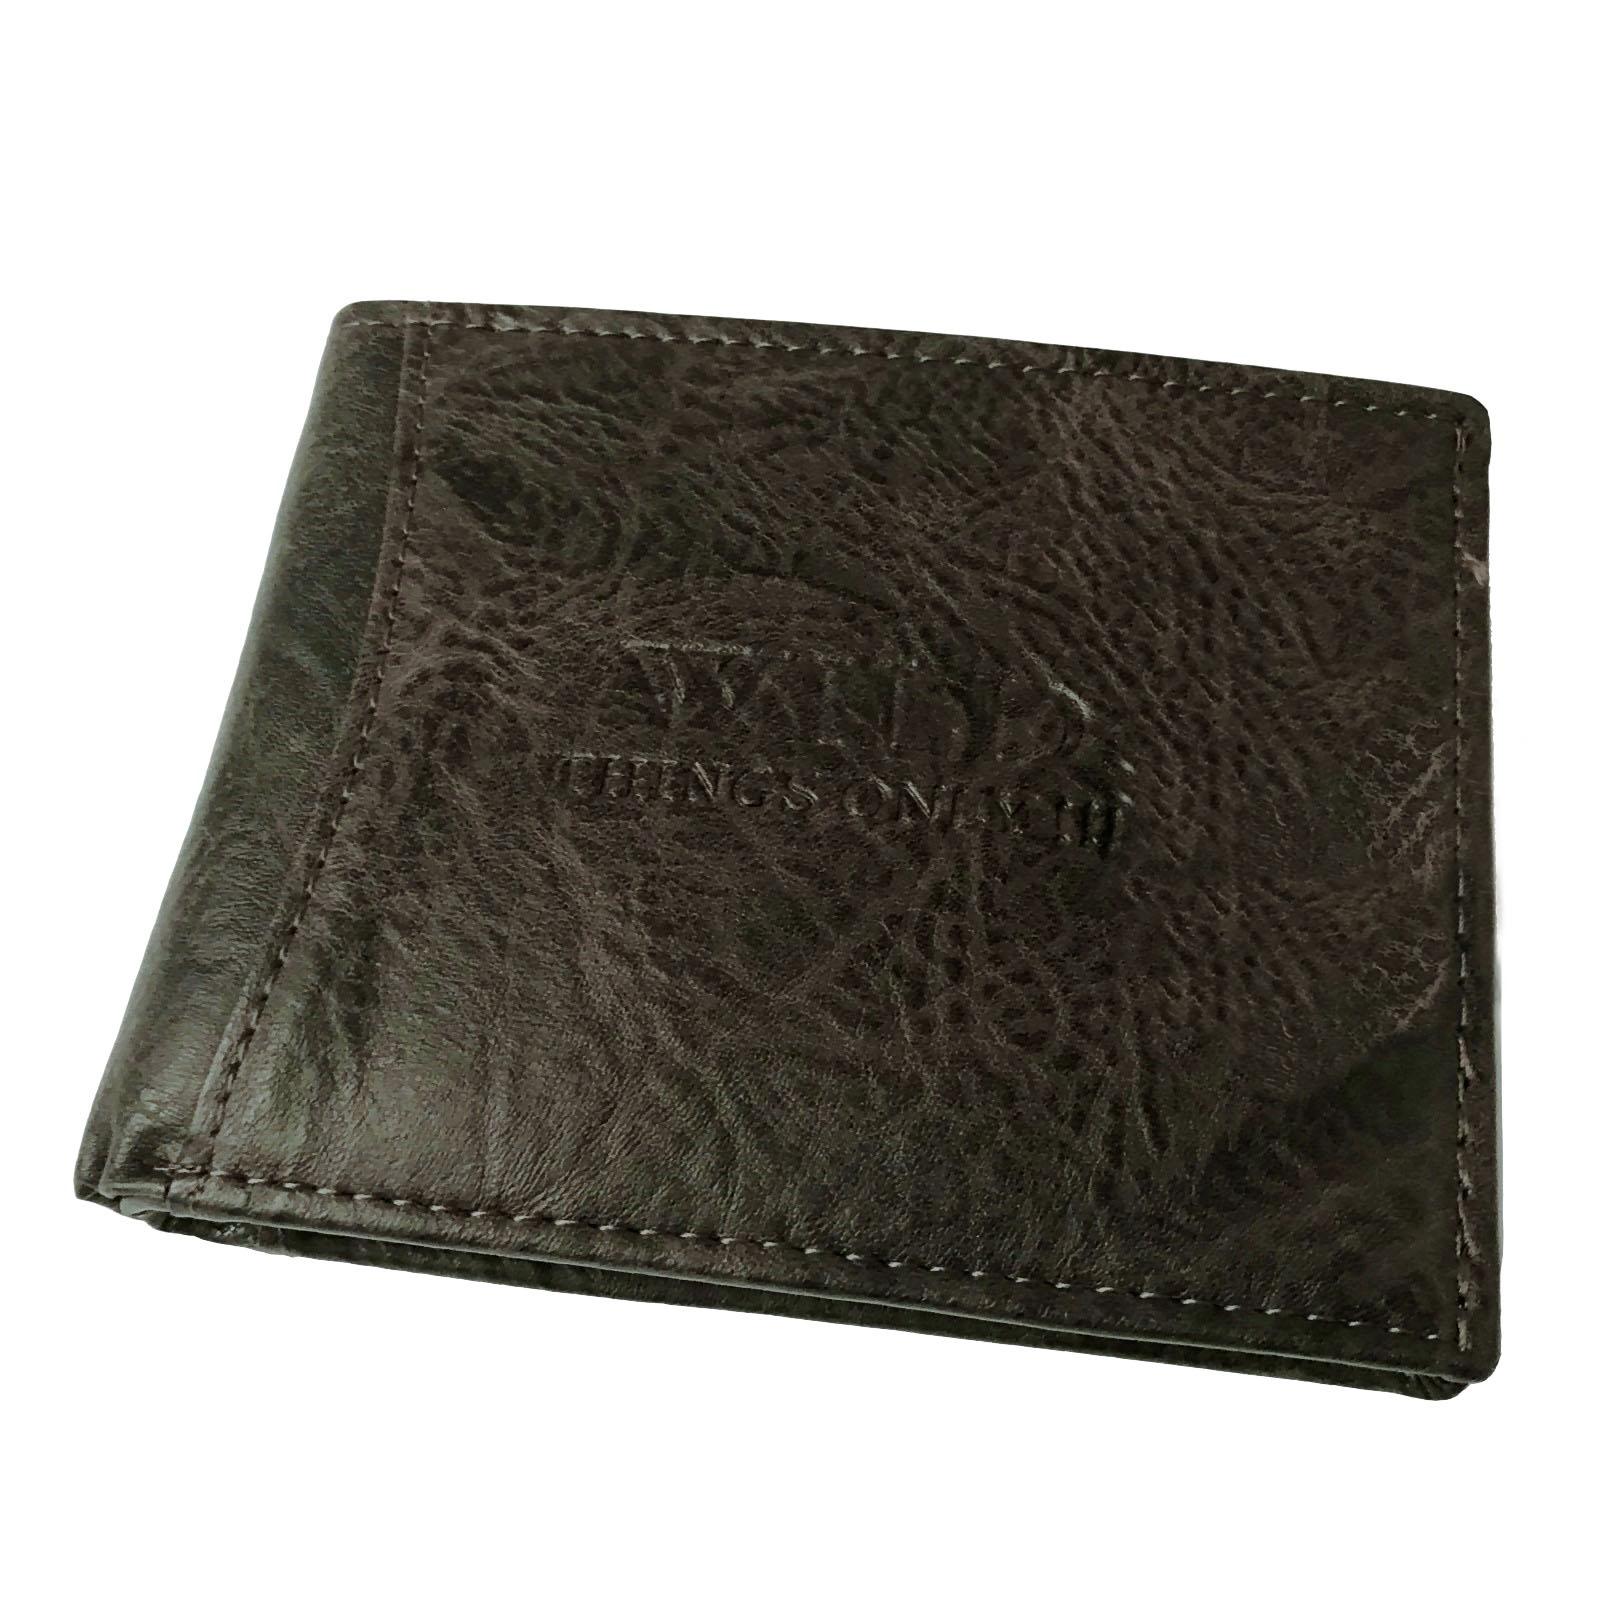 Herren Portemonnaie Leder-Look Geldbörse Bag Street antikbraun Po2600